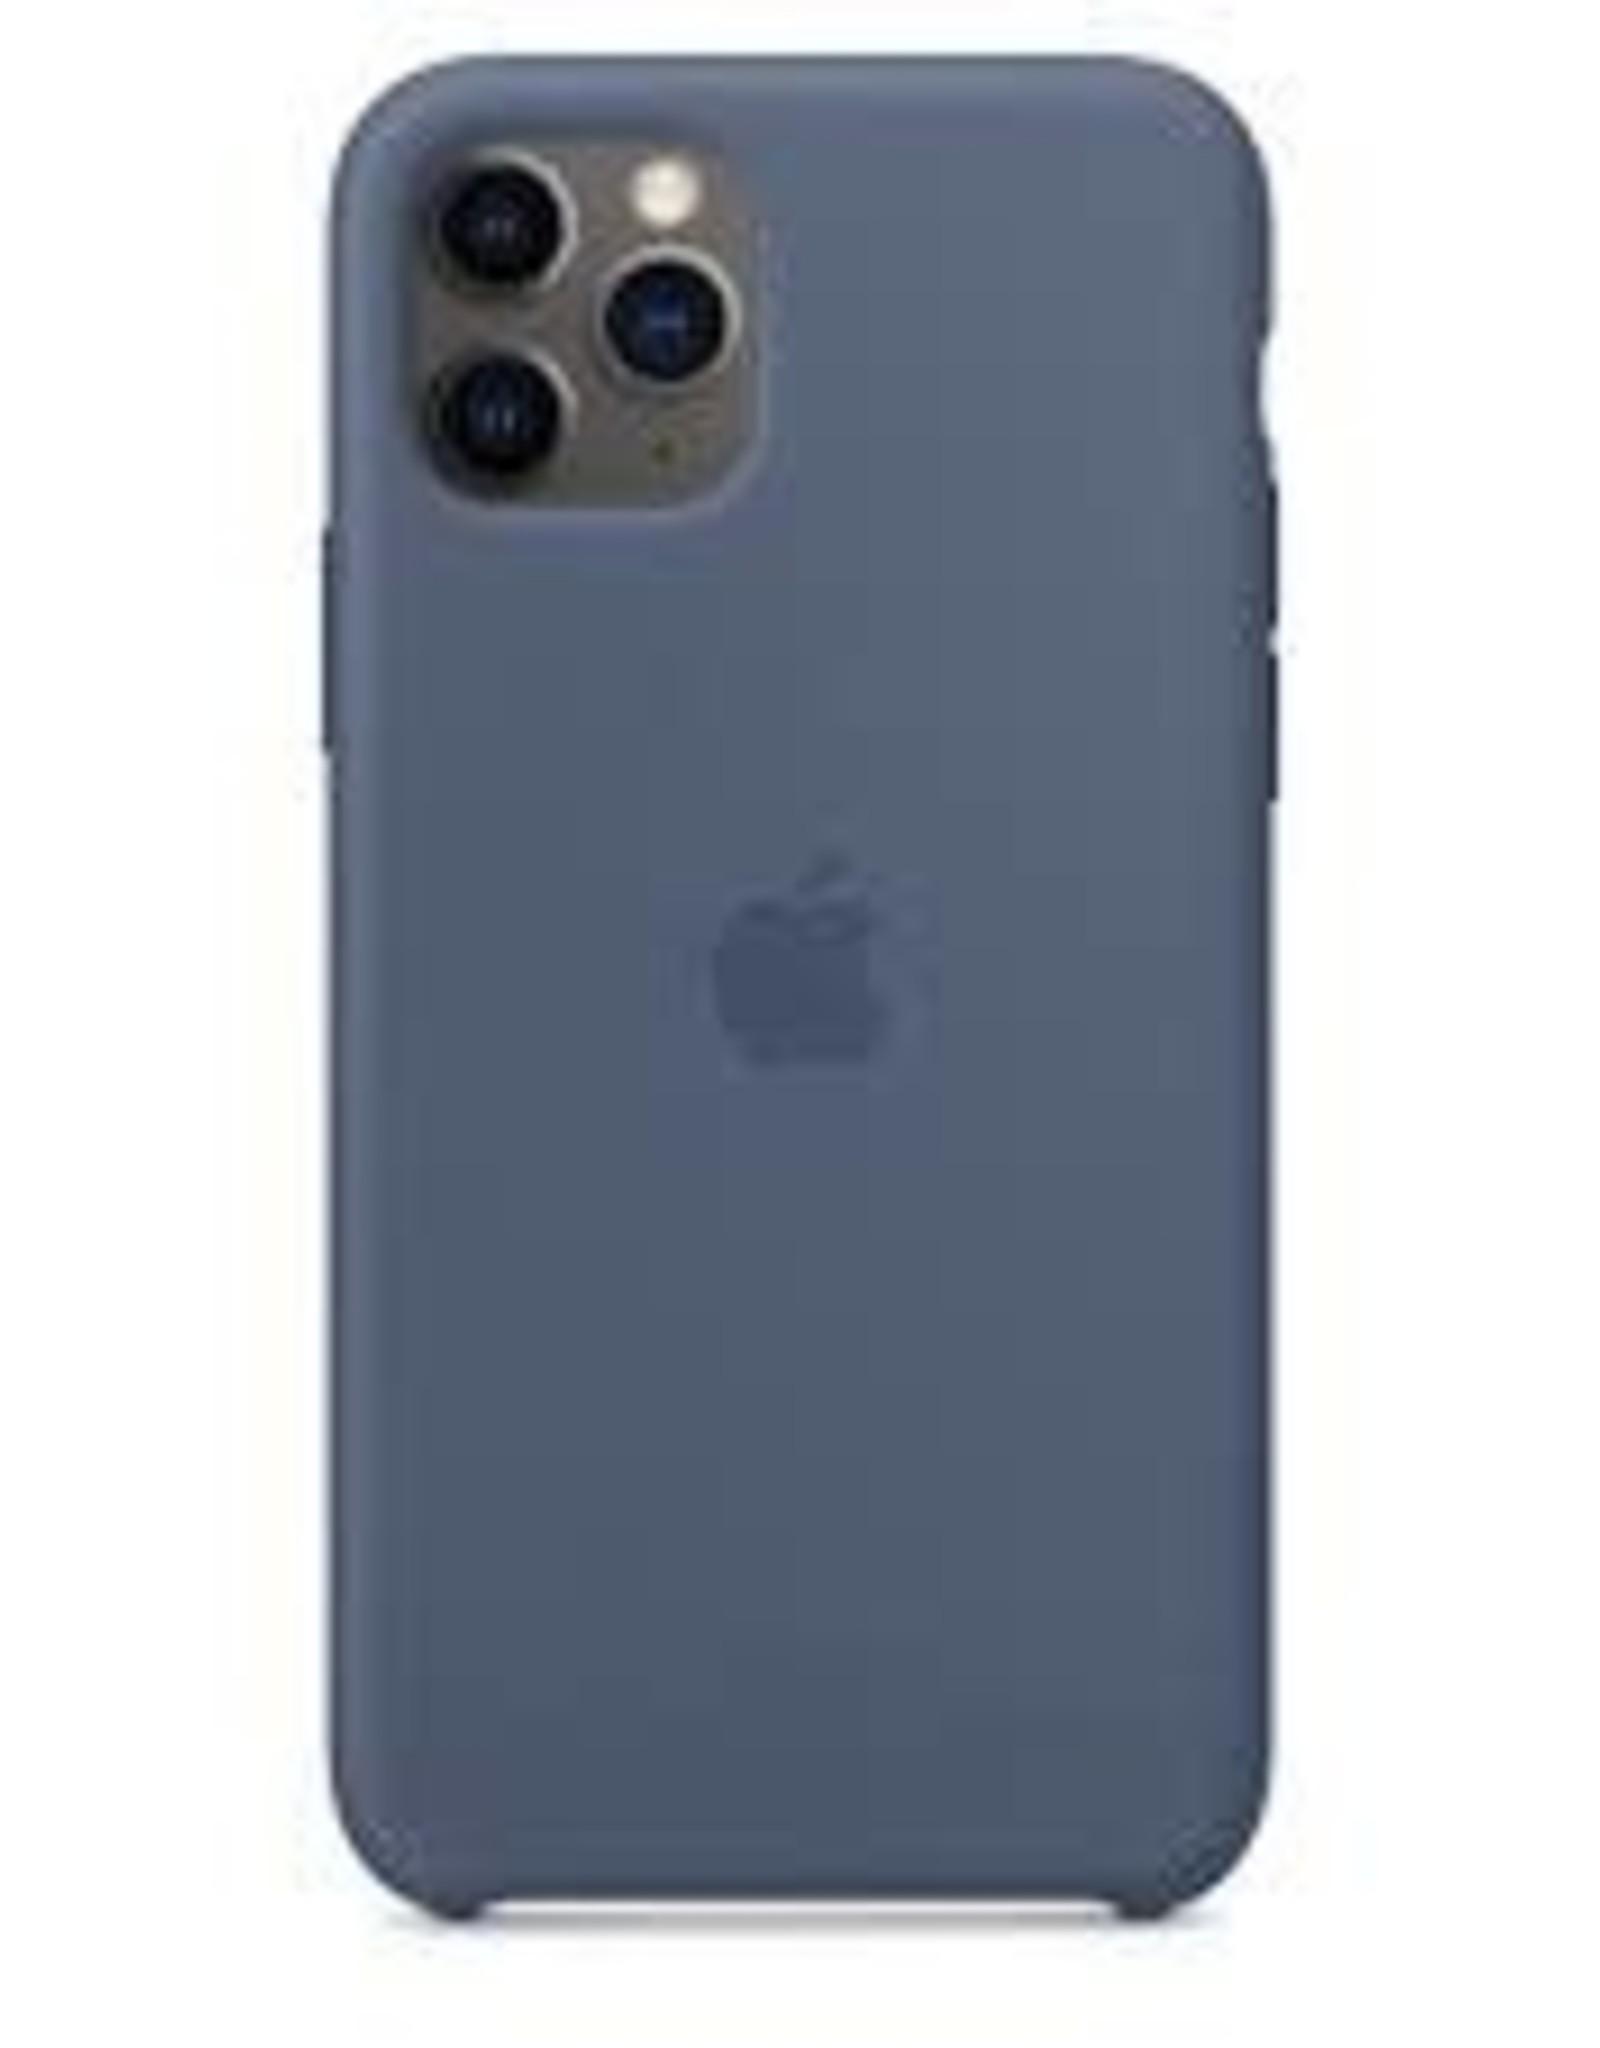 Apple Alaskan Blue iPhone Silicone Case